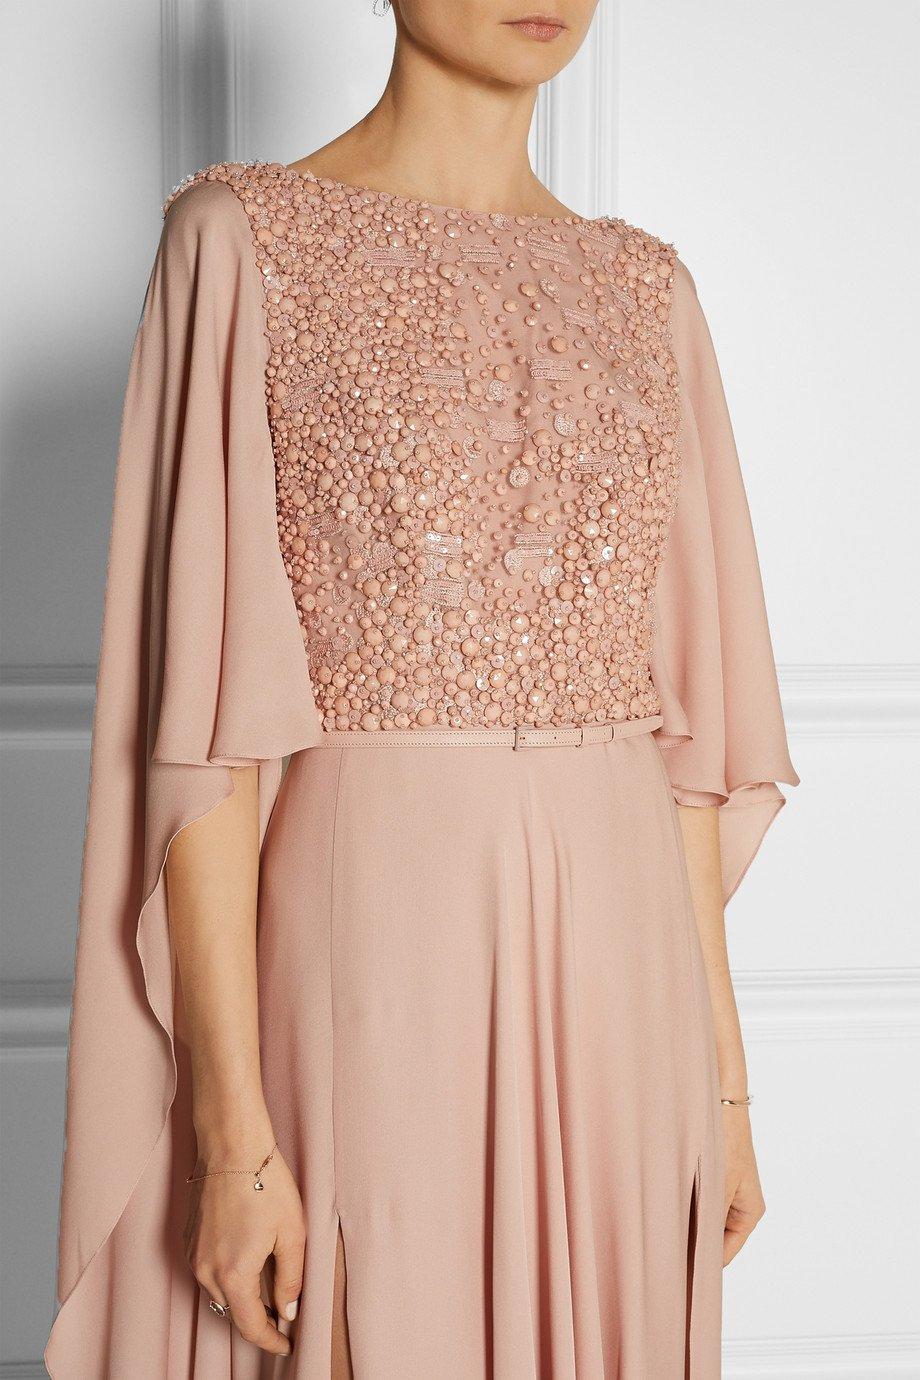 Lyst Elie Saab Embellished Belted Silk Gown In Pink